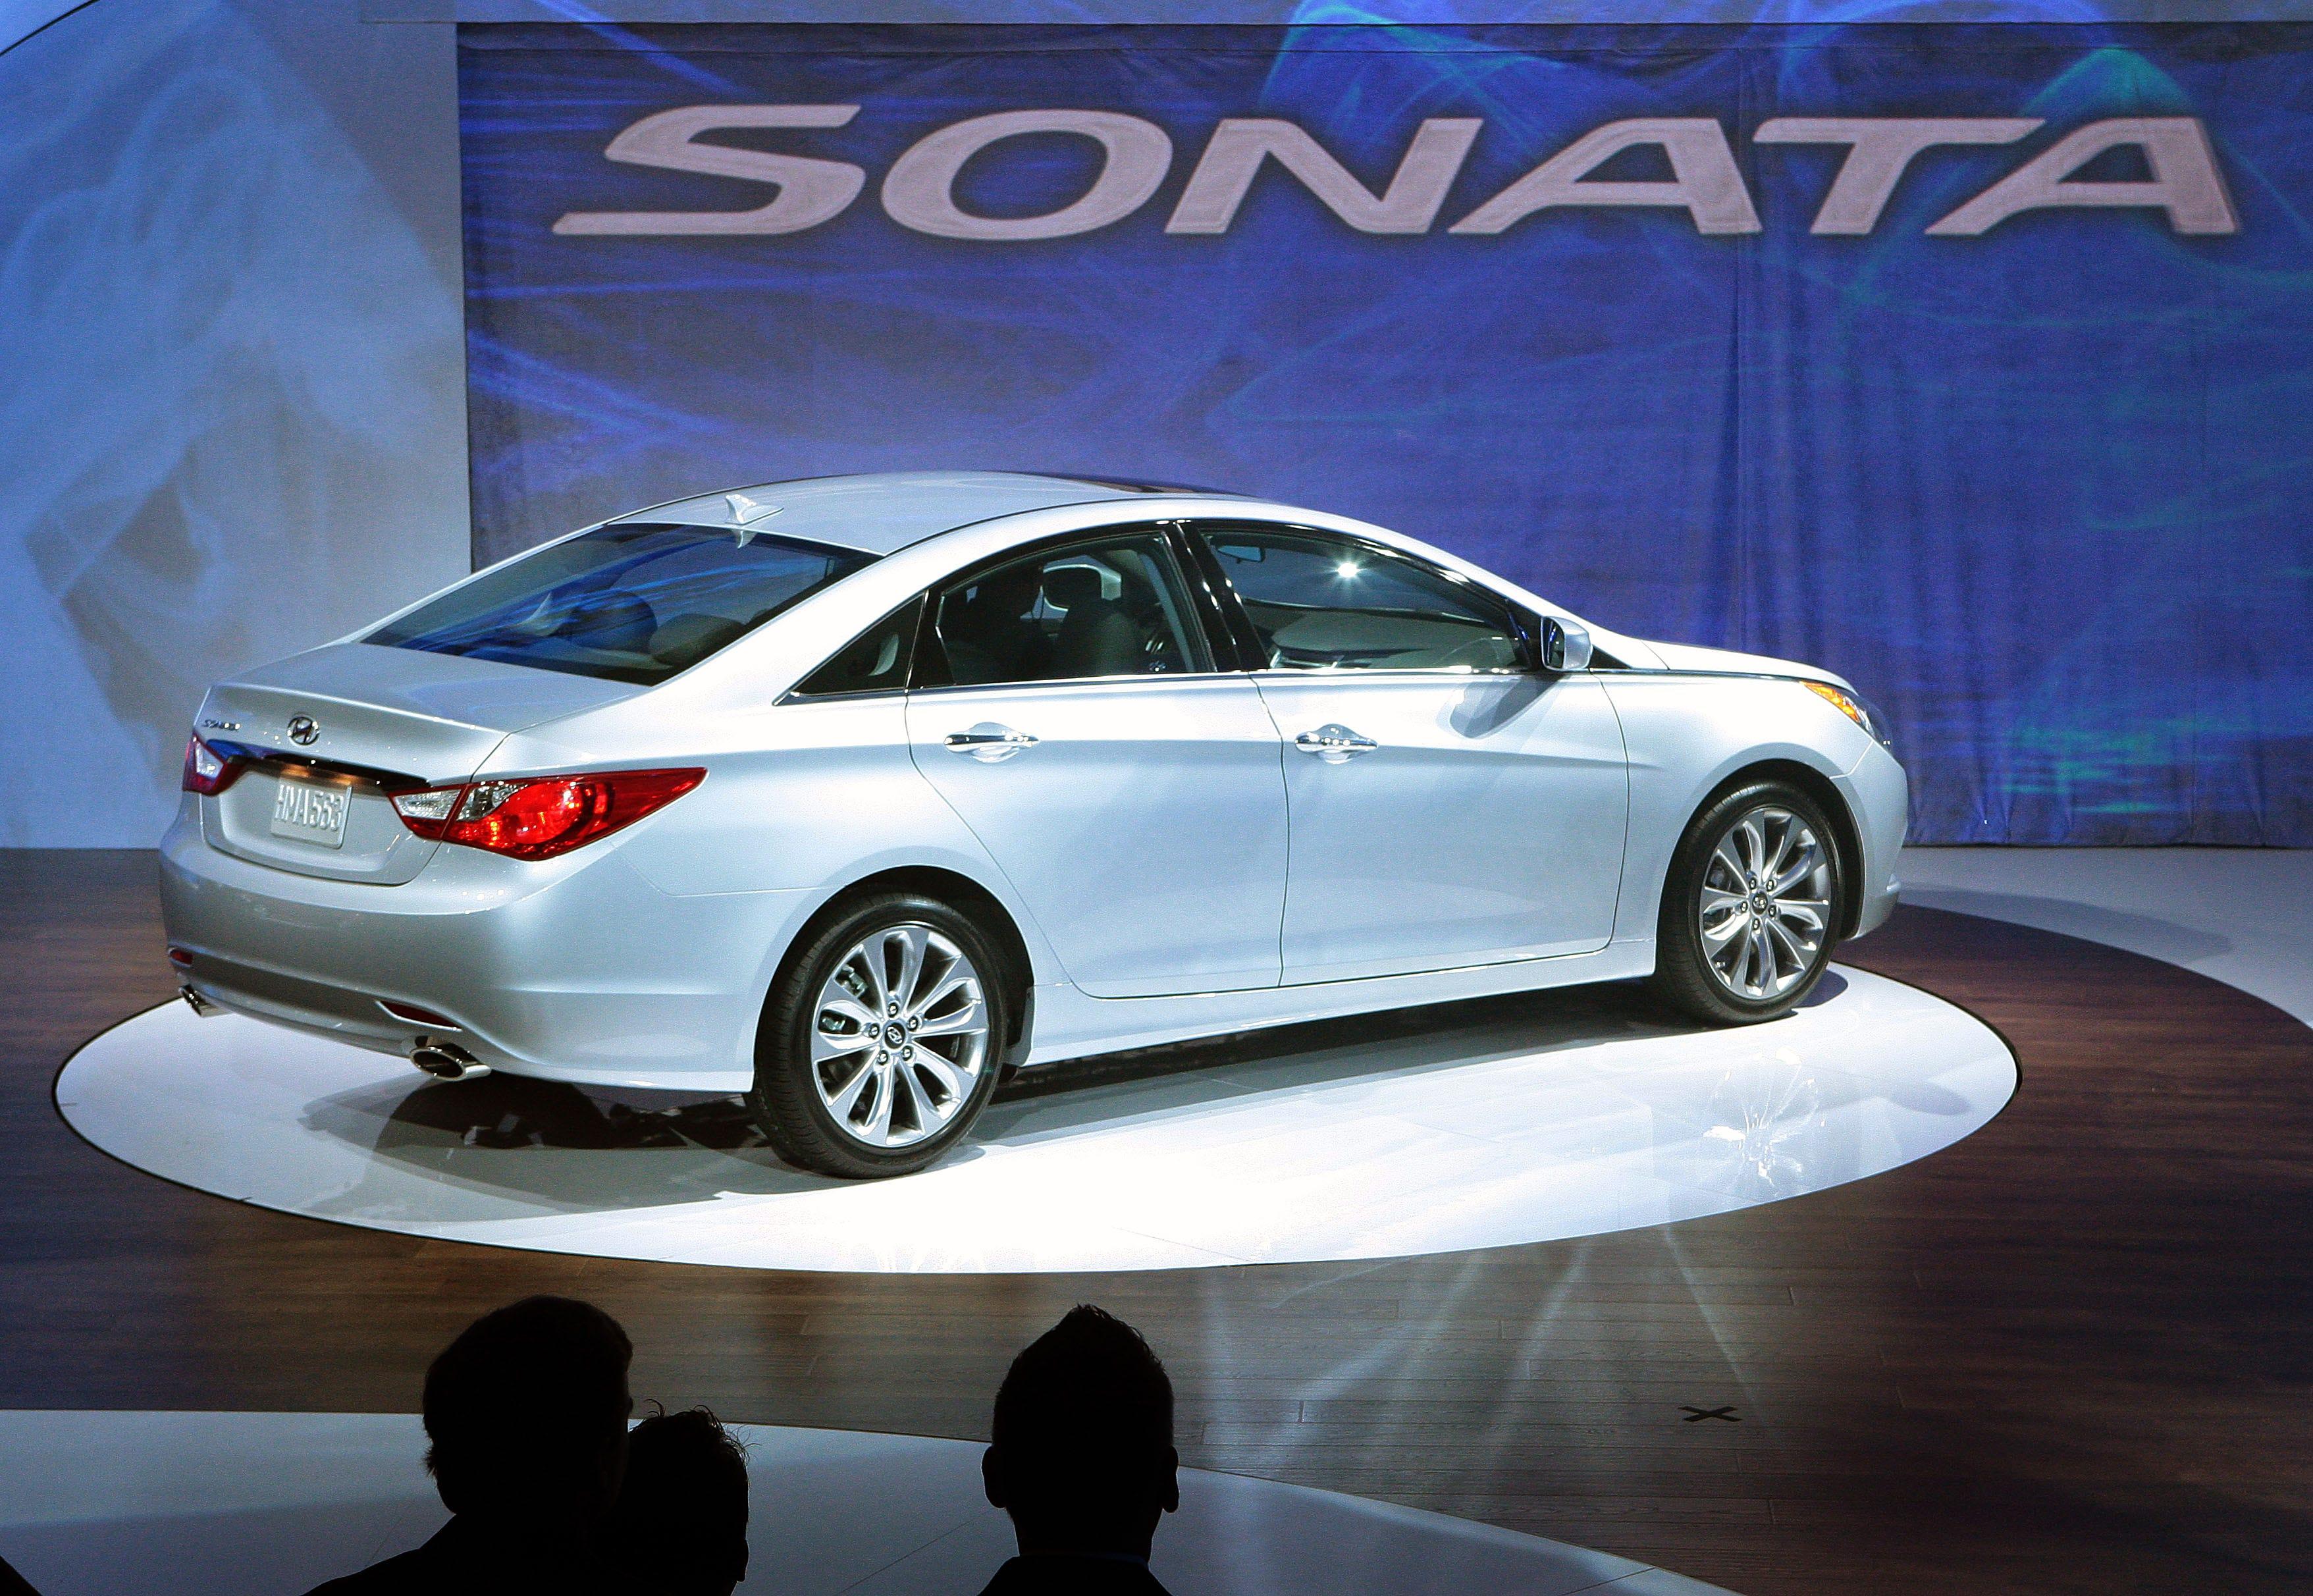 hyundai recalls 470 000 sonatas to fix engine problem rh usatoday com 09 Hyundai Sonata Black 09 Hyundai Sonata Trunk